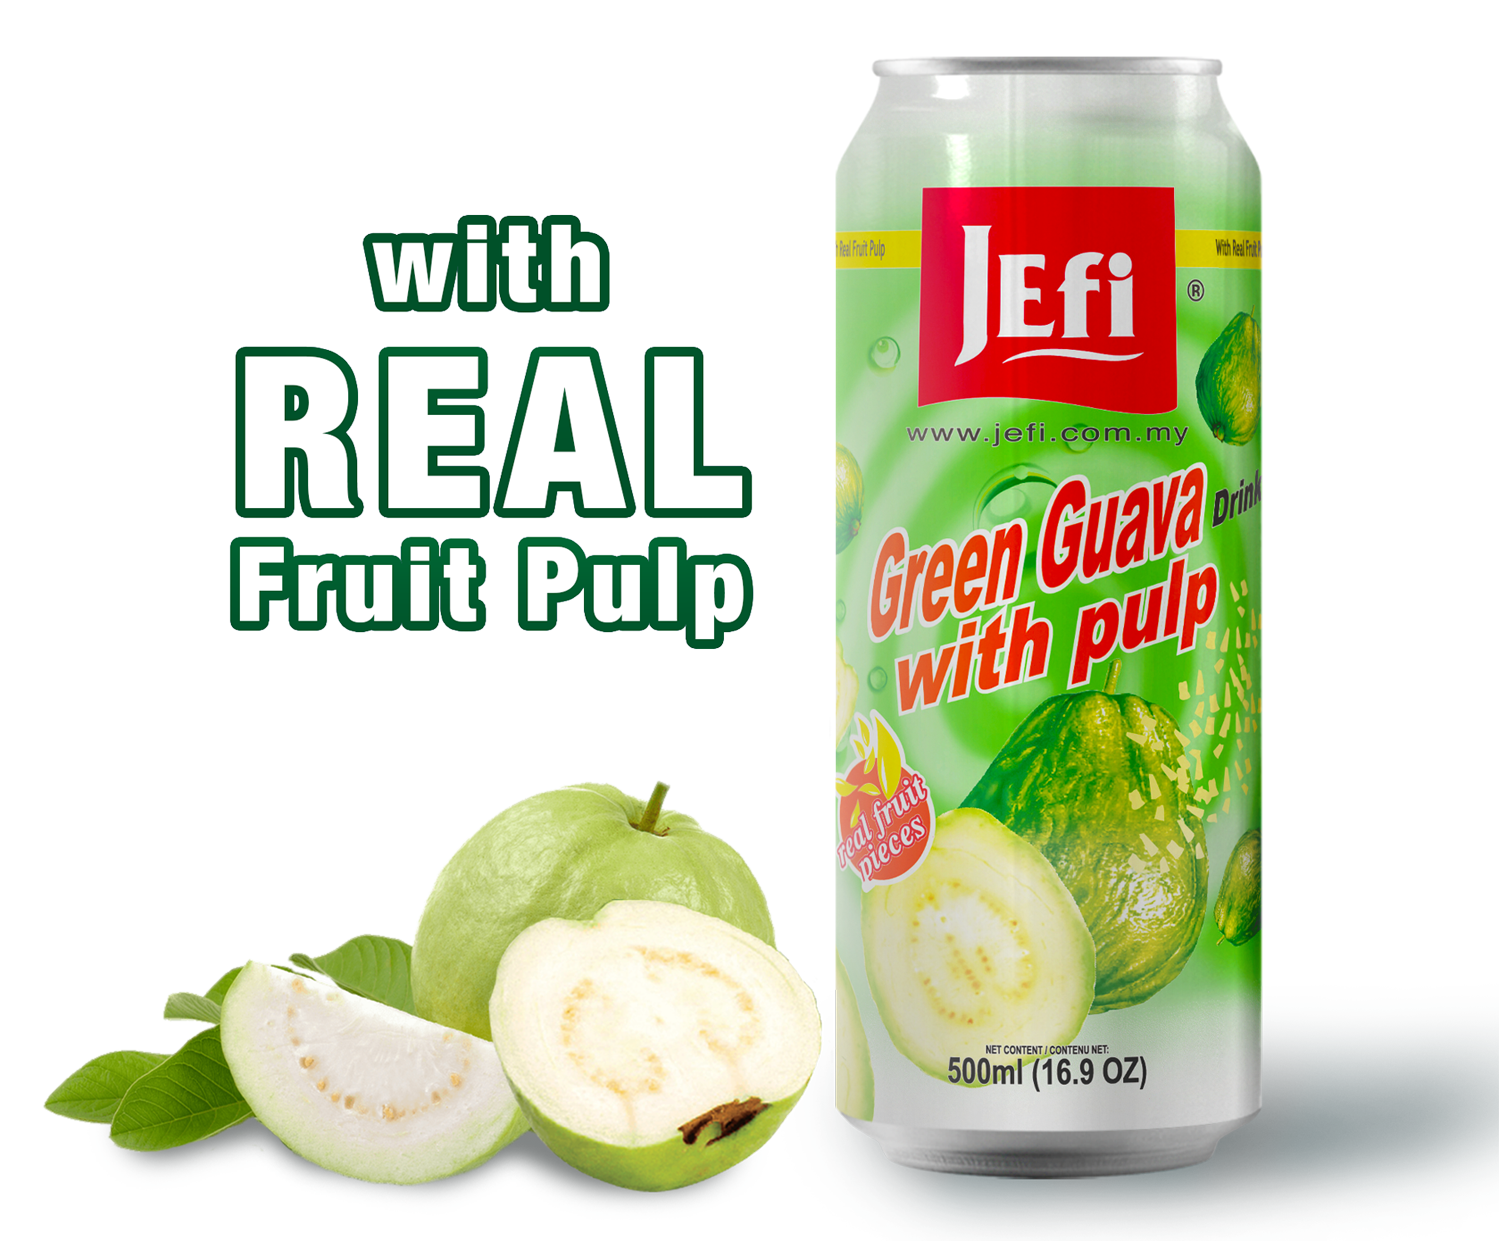 JEFI Green Guava Drinks with Real Fruit Pulp (500ml x 1tin)